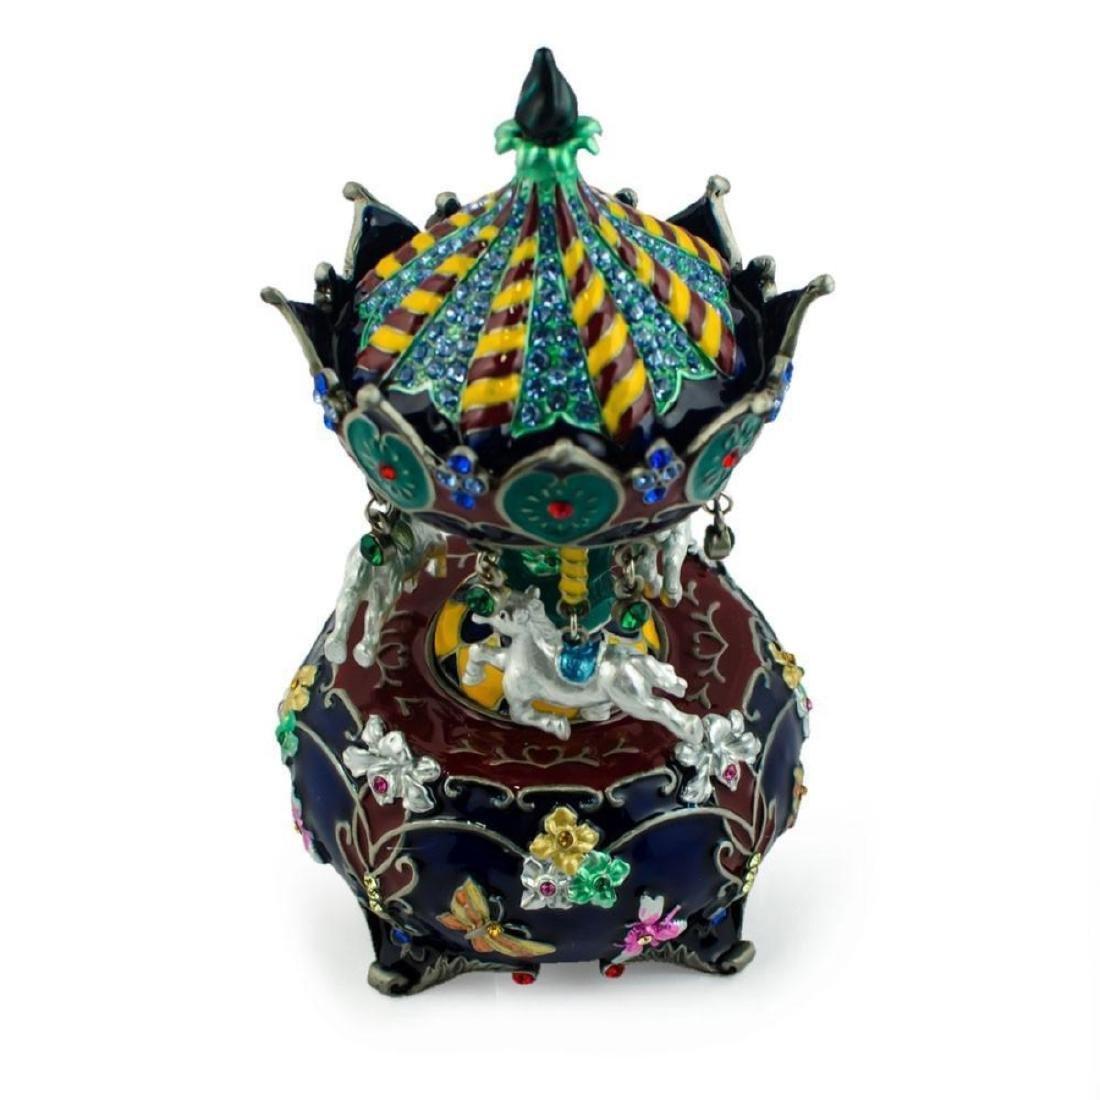 Jeweled Royal Inspired Russian Carousel Figurine 5.5 - 2